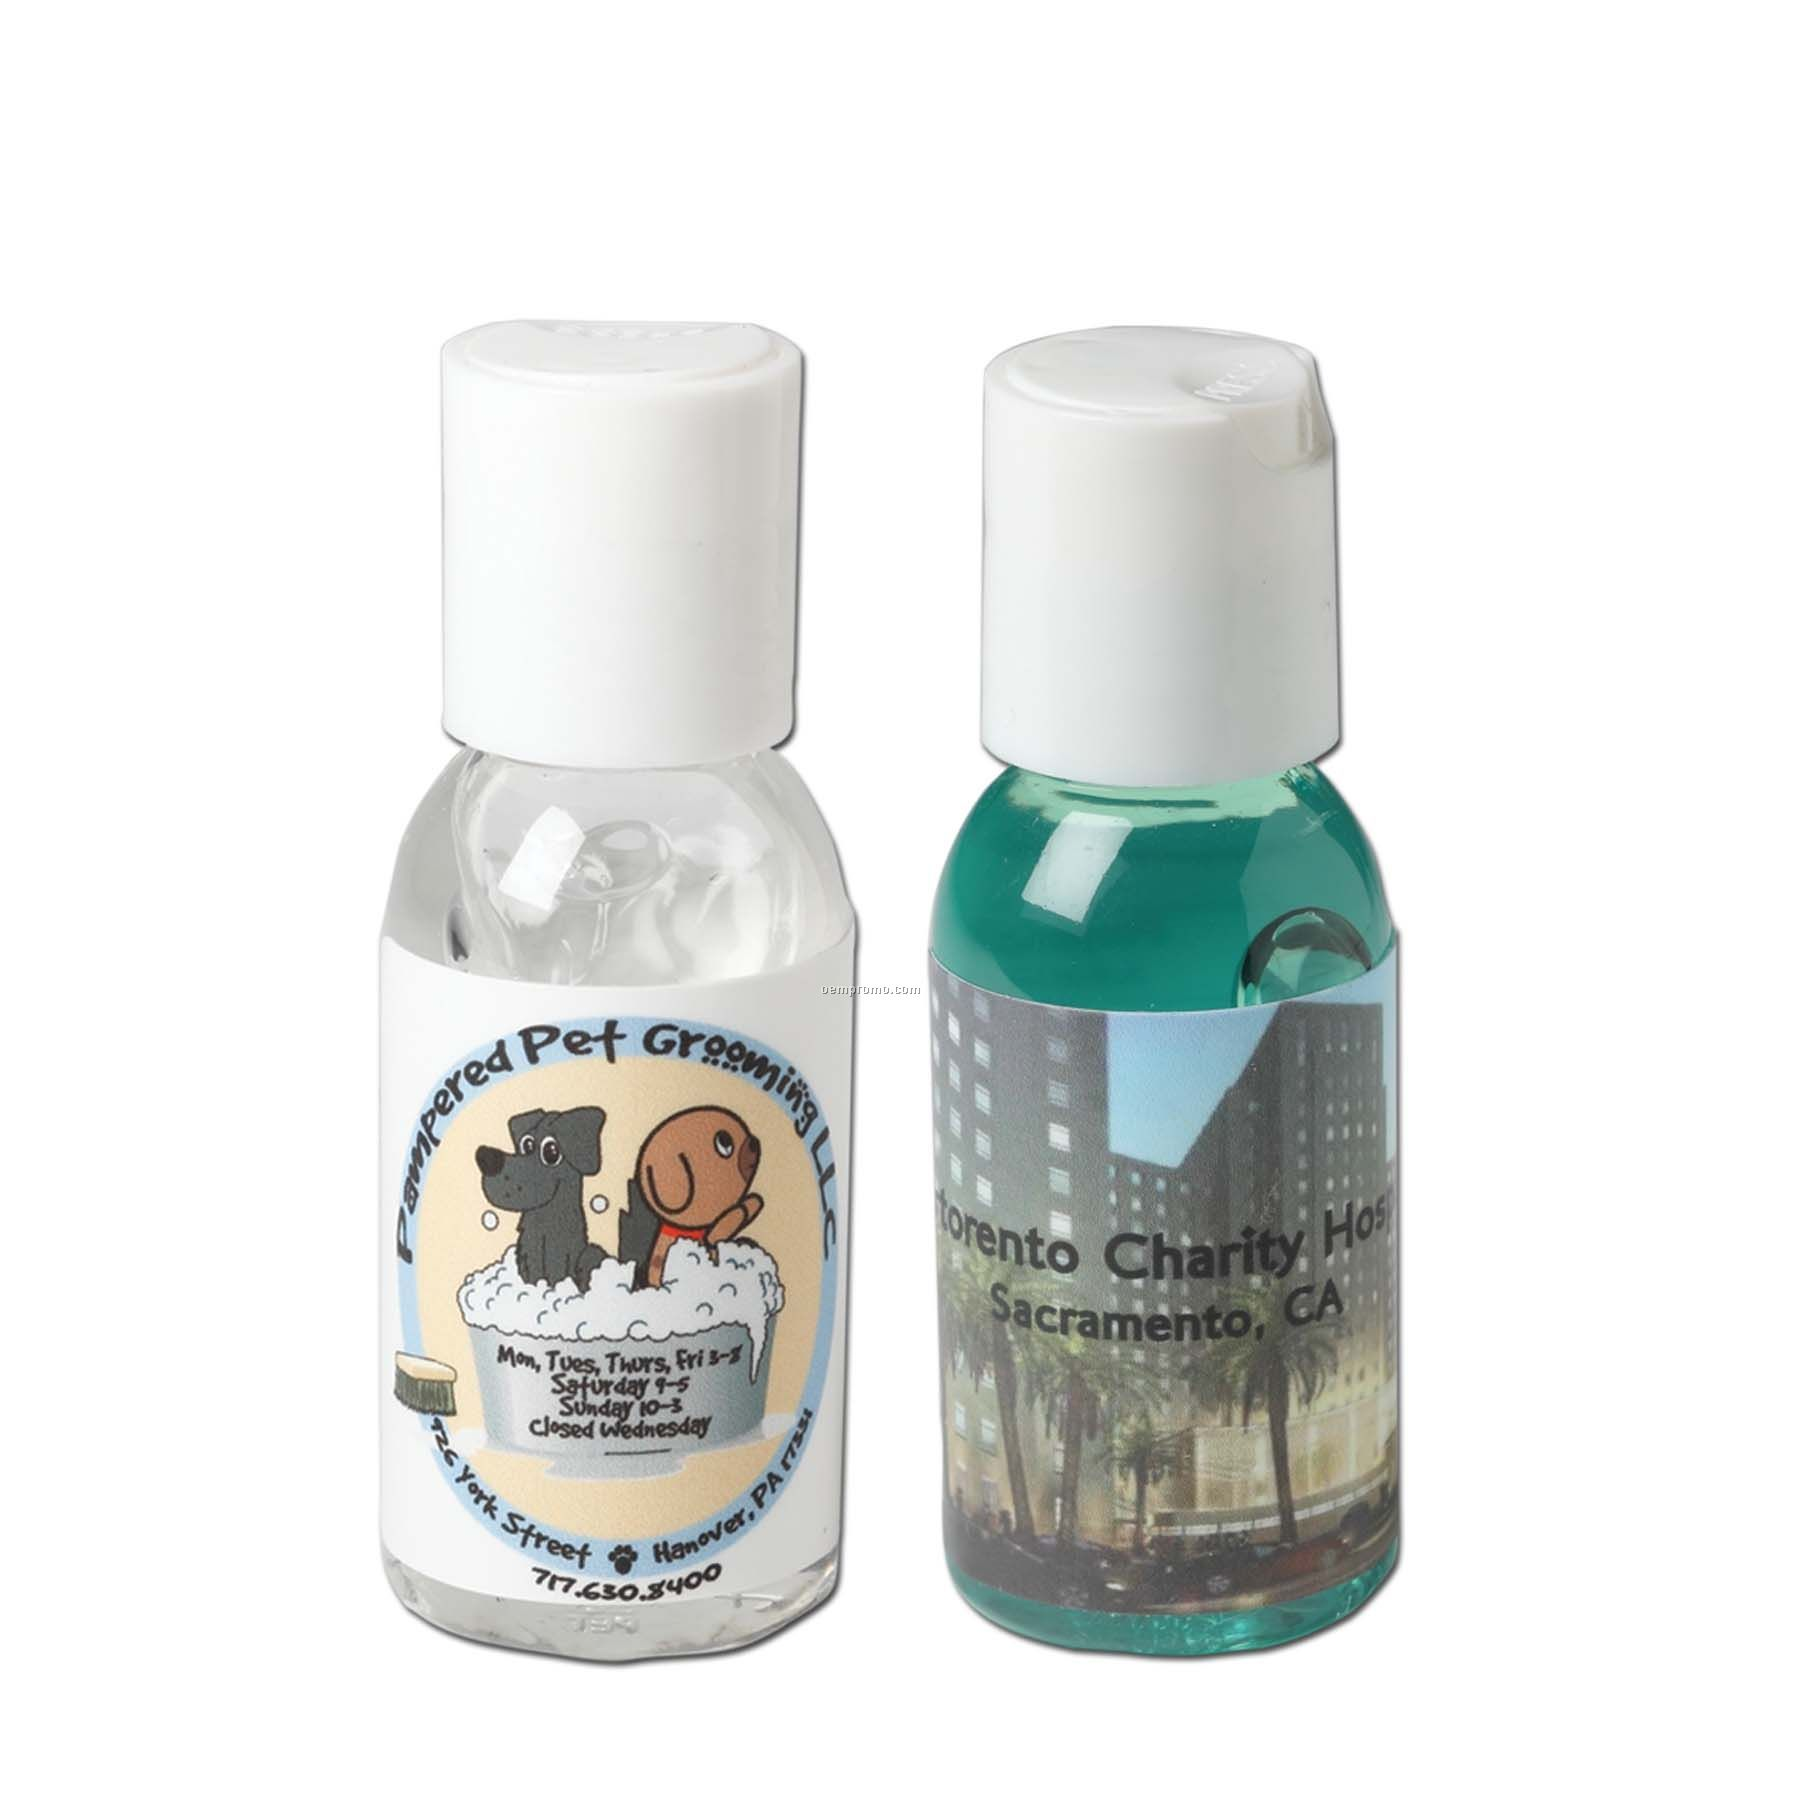 Antibacterial Hand Sanitizing Gel - 1 Oz.